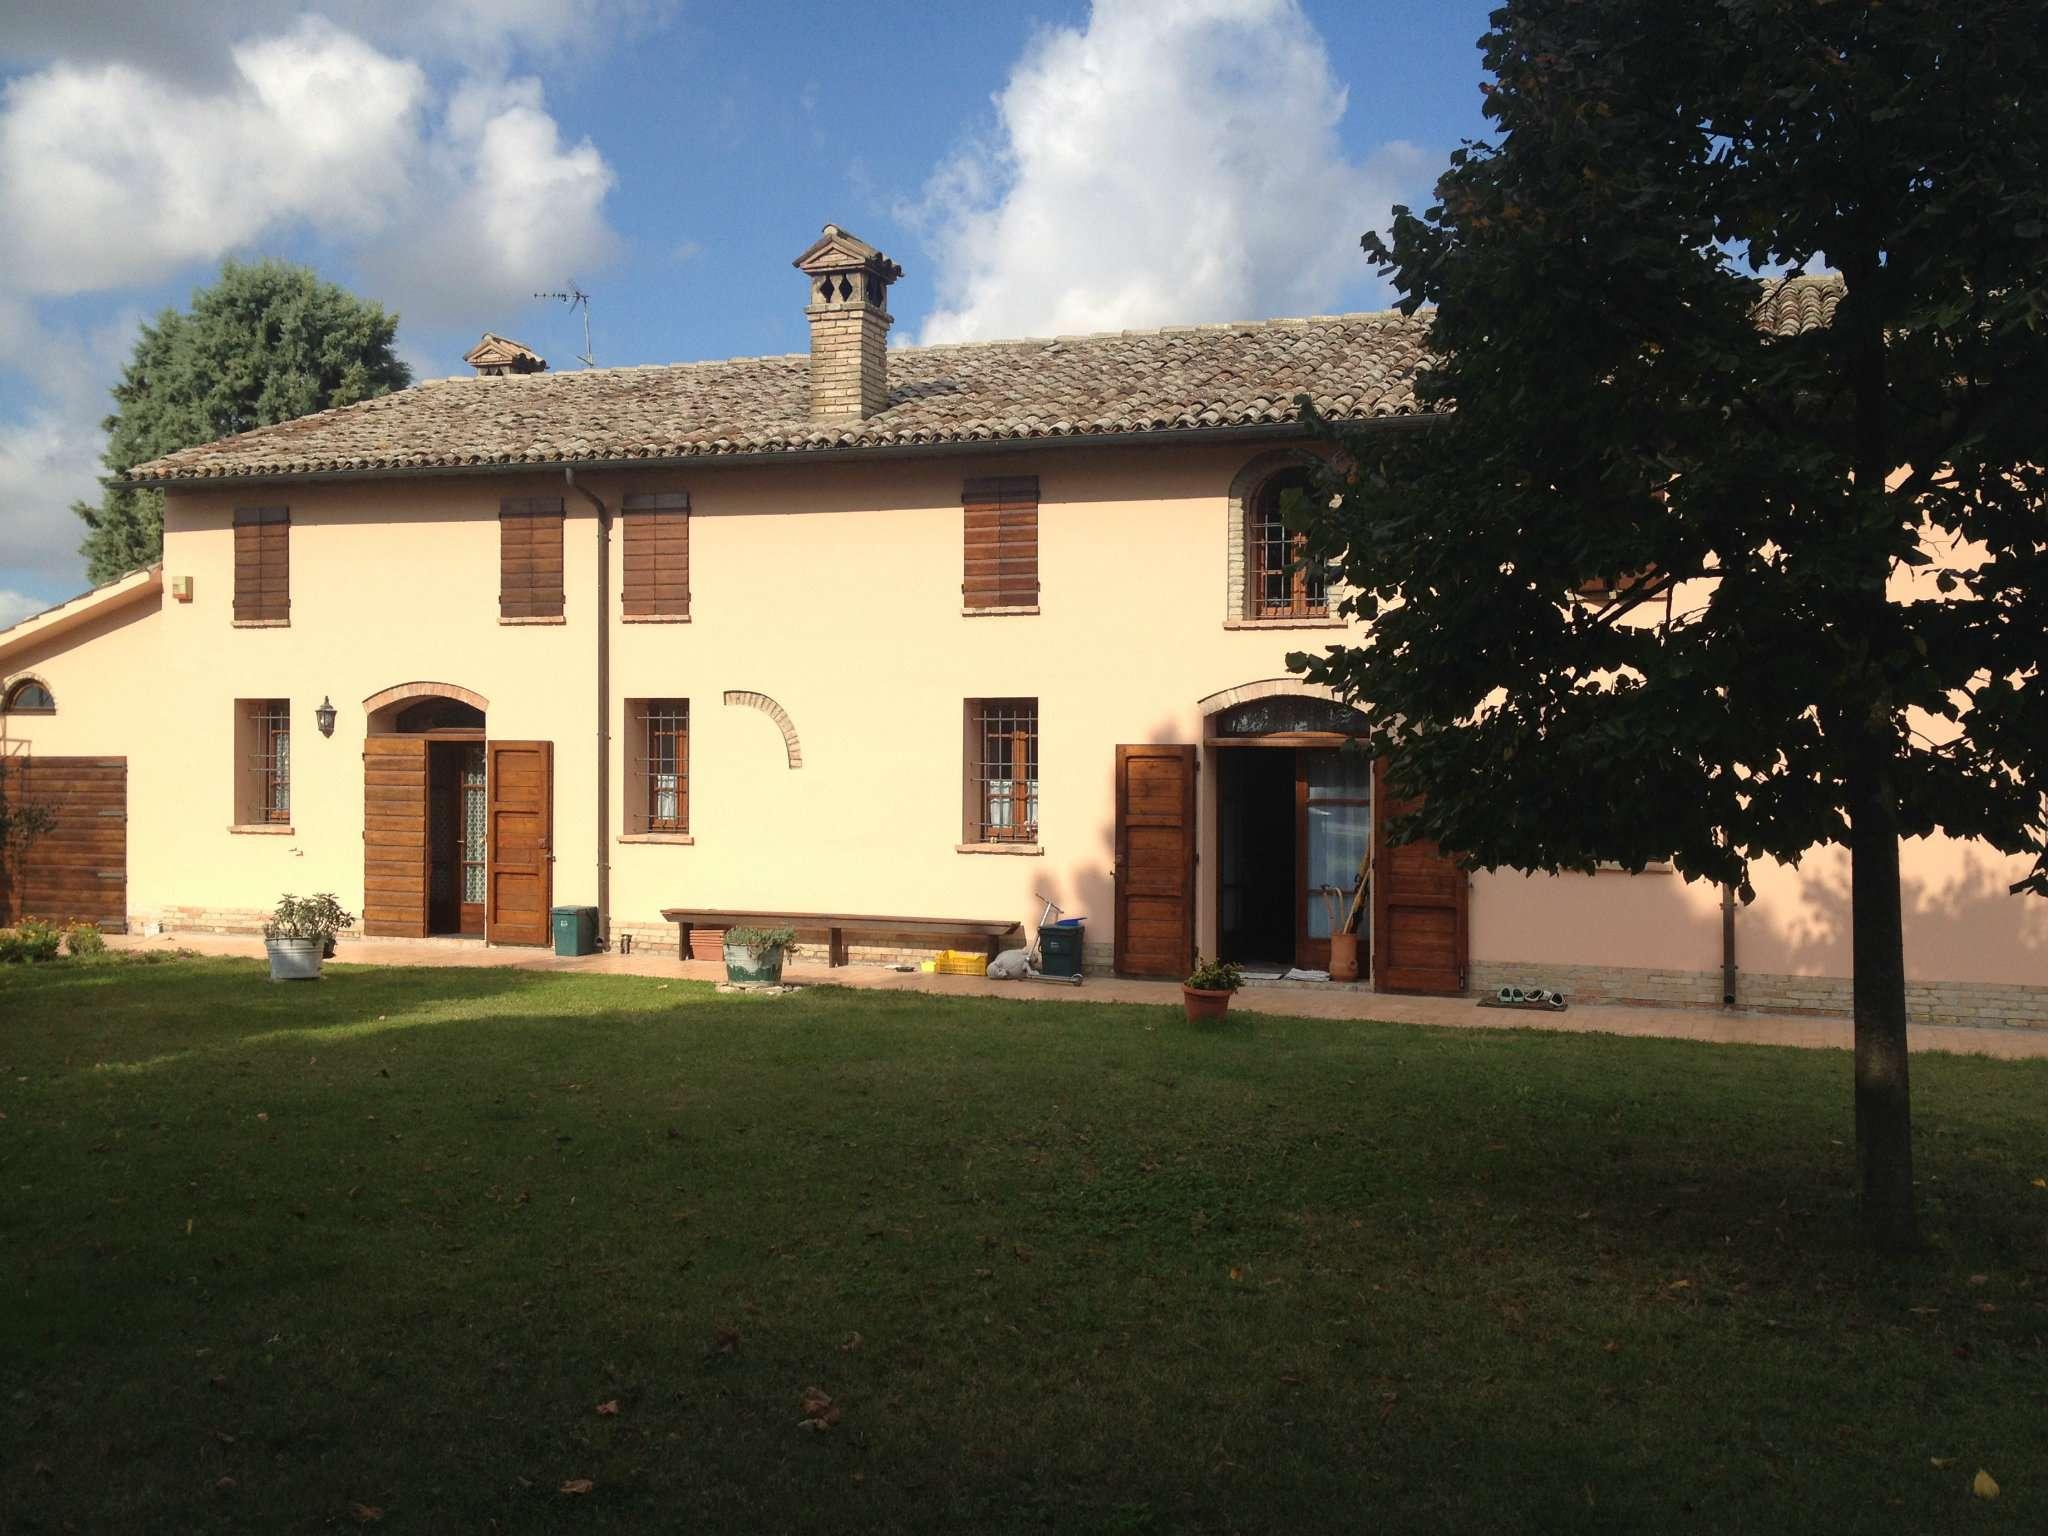 Rustico in Vendita a Ravenna Periferia Sud: 5 locali, 600 mq